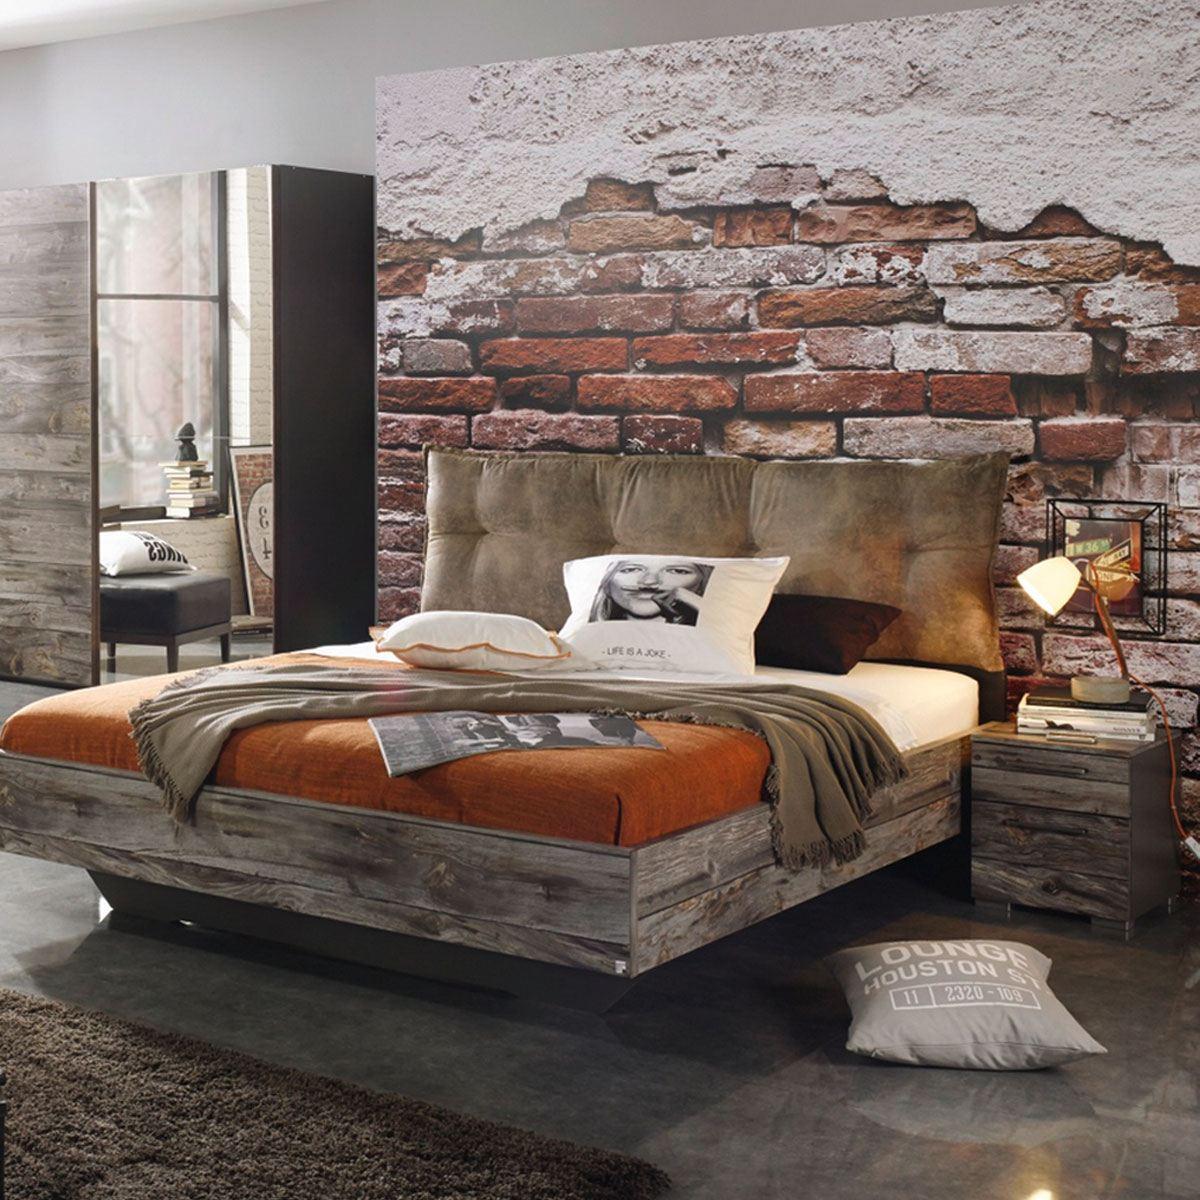 Rauch Select Timberstyle Bett mit Polster-Kissen Farbasführung Sunwood /  graphit mit Absetzung Antik Liegefläche wählbar optional mit Nachttisch ...